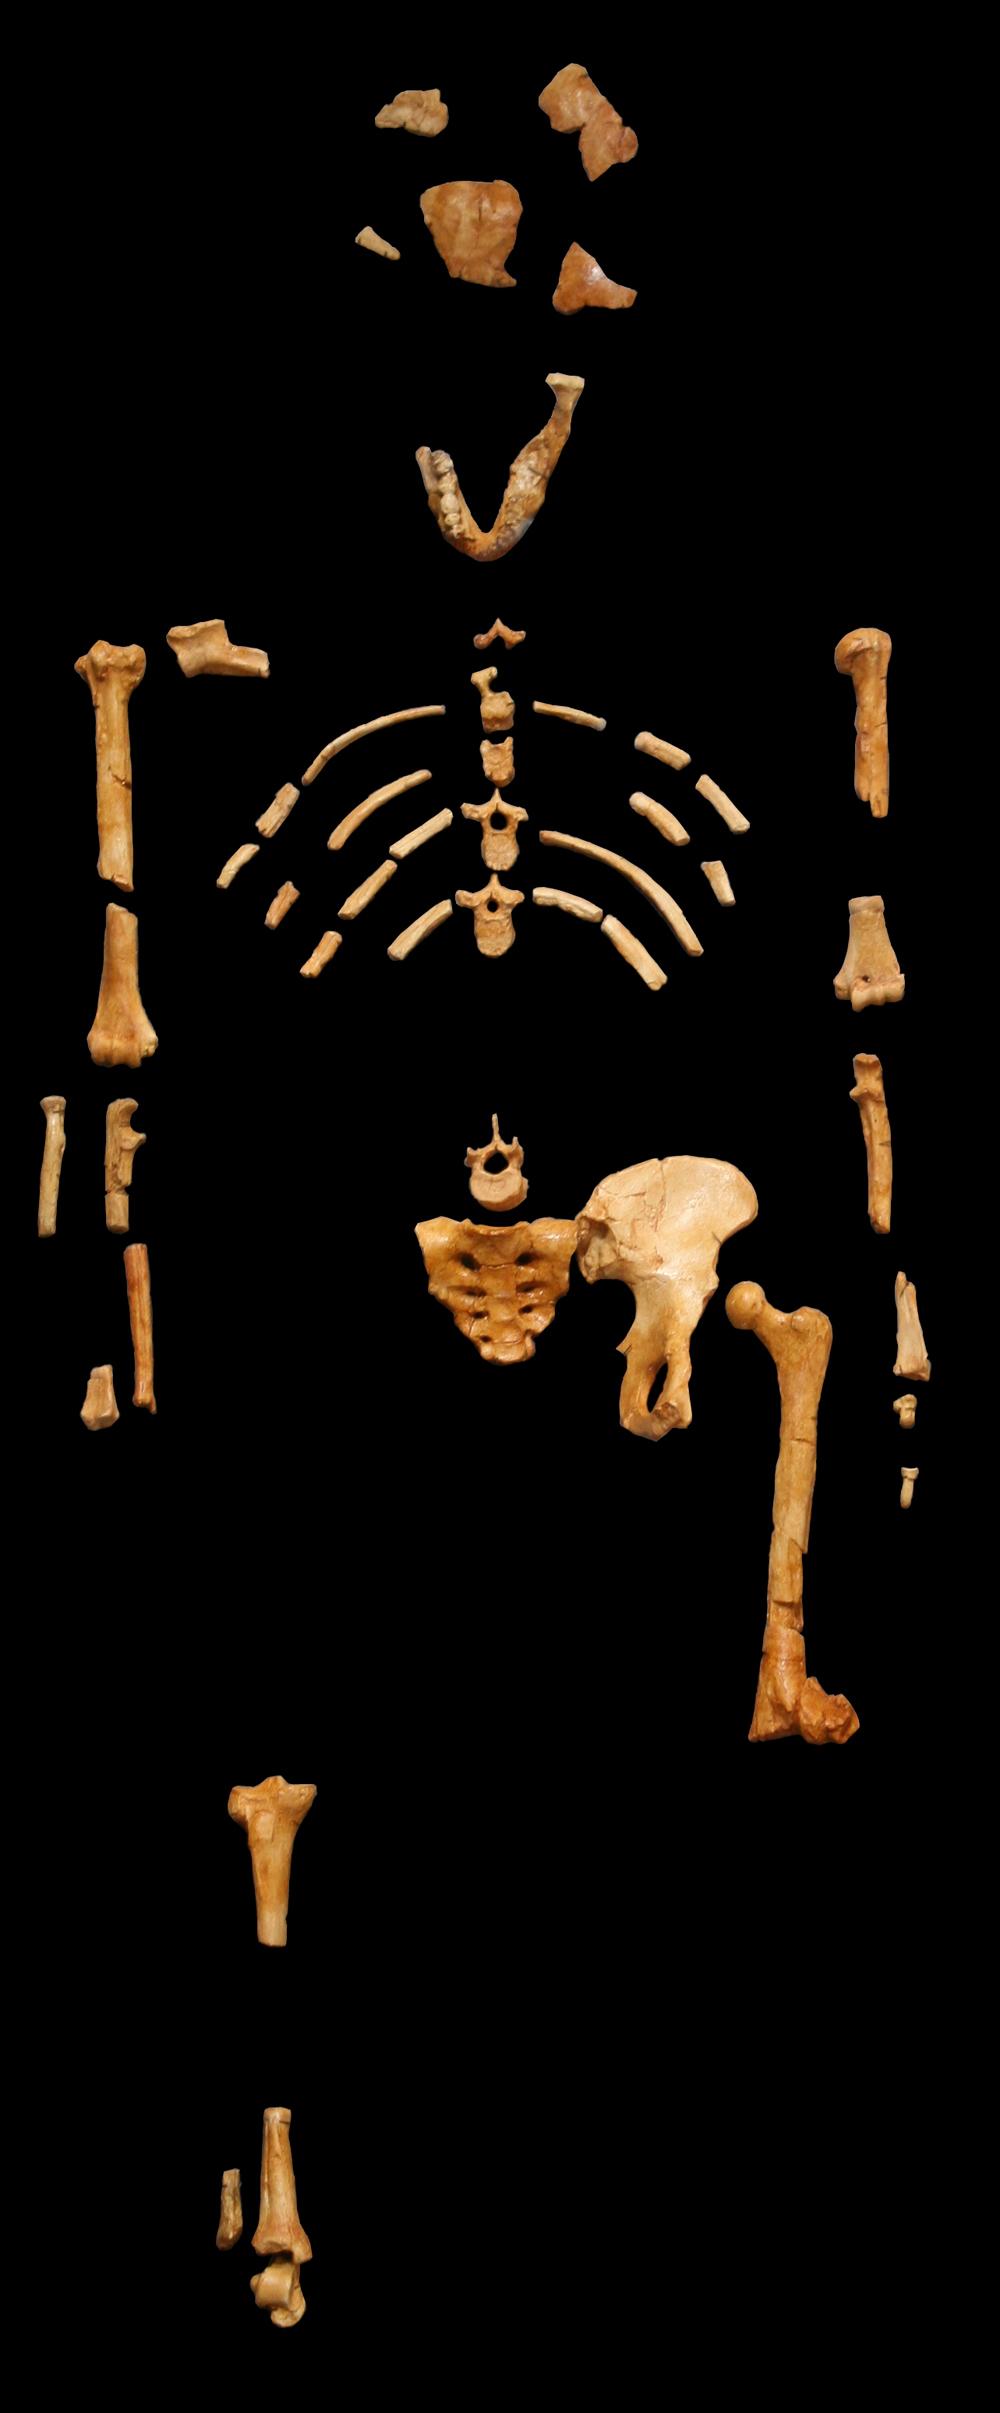 Lucy (Australopithecus)